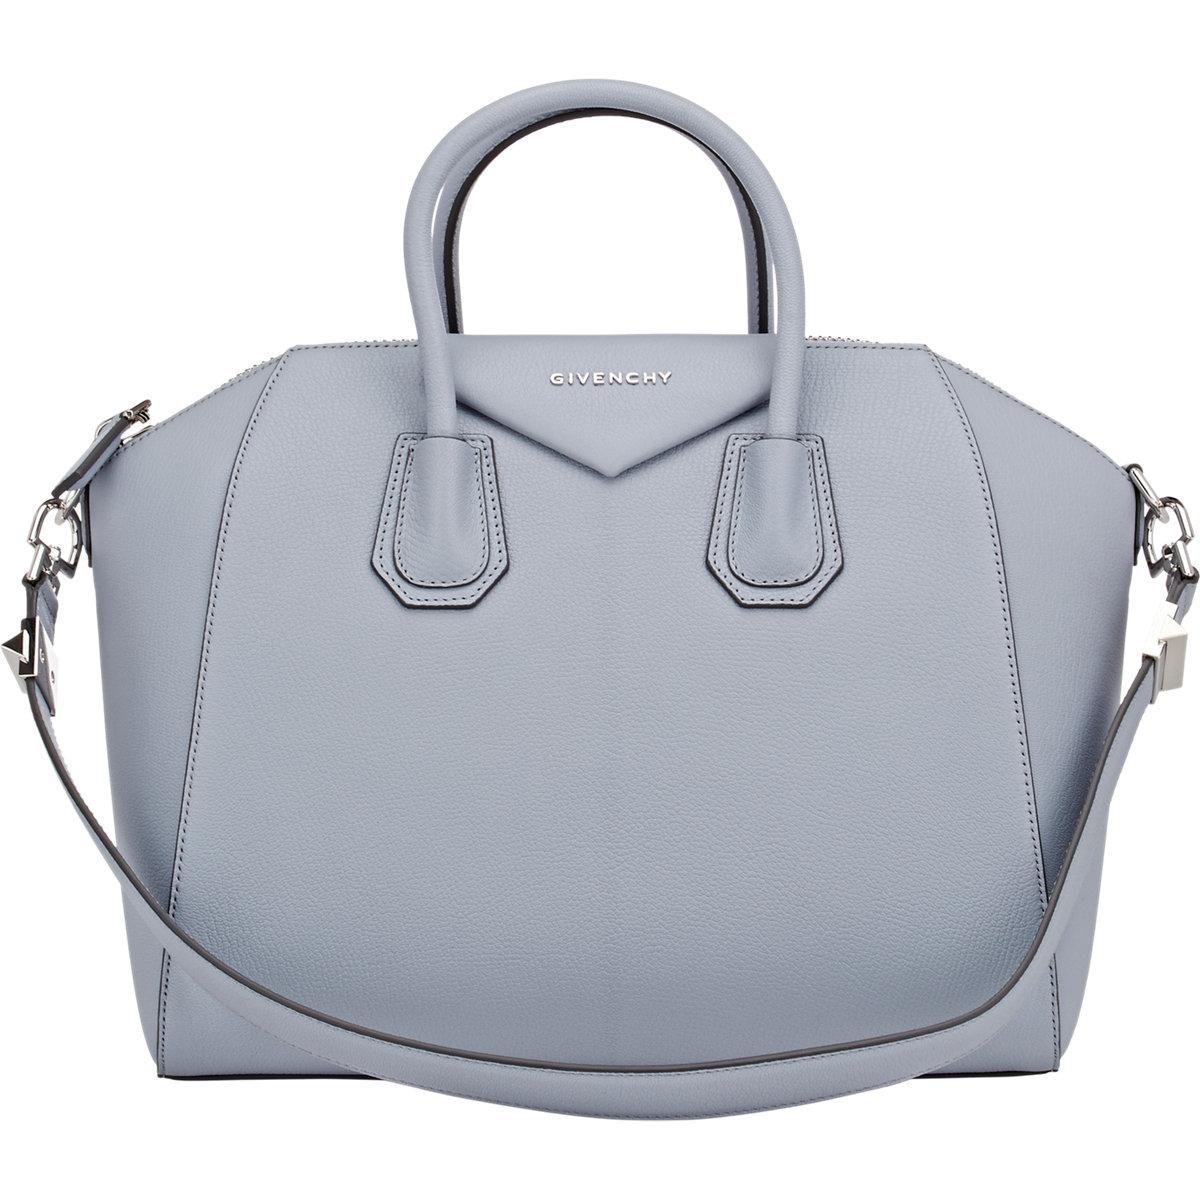 1d2fae00f548 Previously sold at Barneys New York · Womens Duffel Bags Womens Givenchy  Antigona . Givenchy Antigona Mini Leather Duffel Bag ...